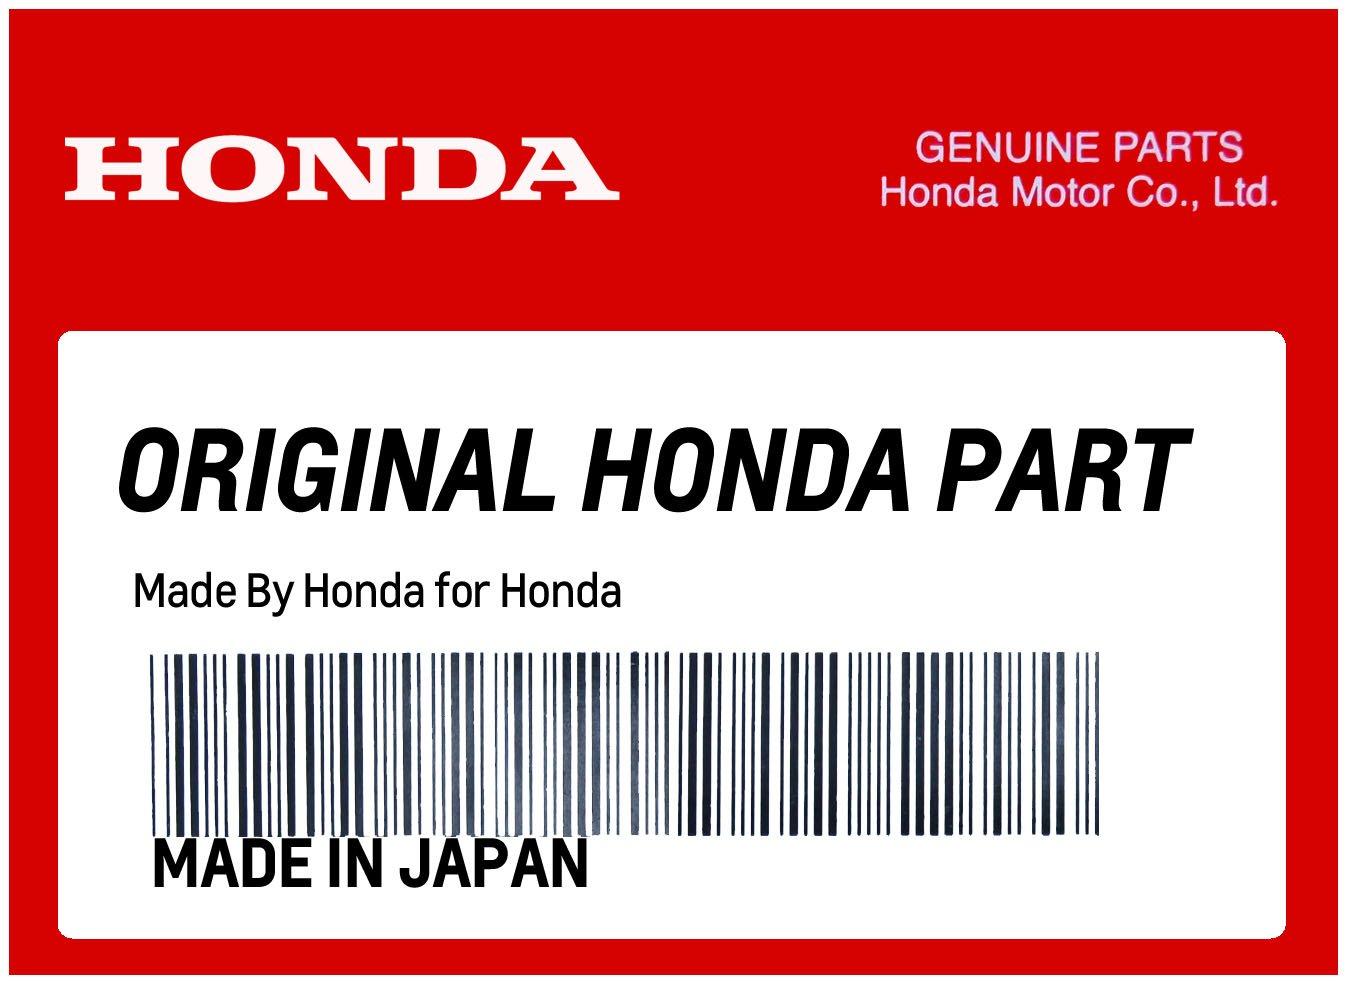 HONDA 11191-KBG-772 New product type GASKET Regular dealer CRANKCASE